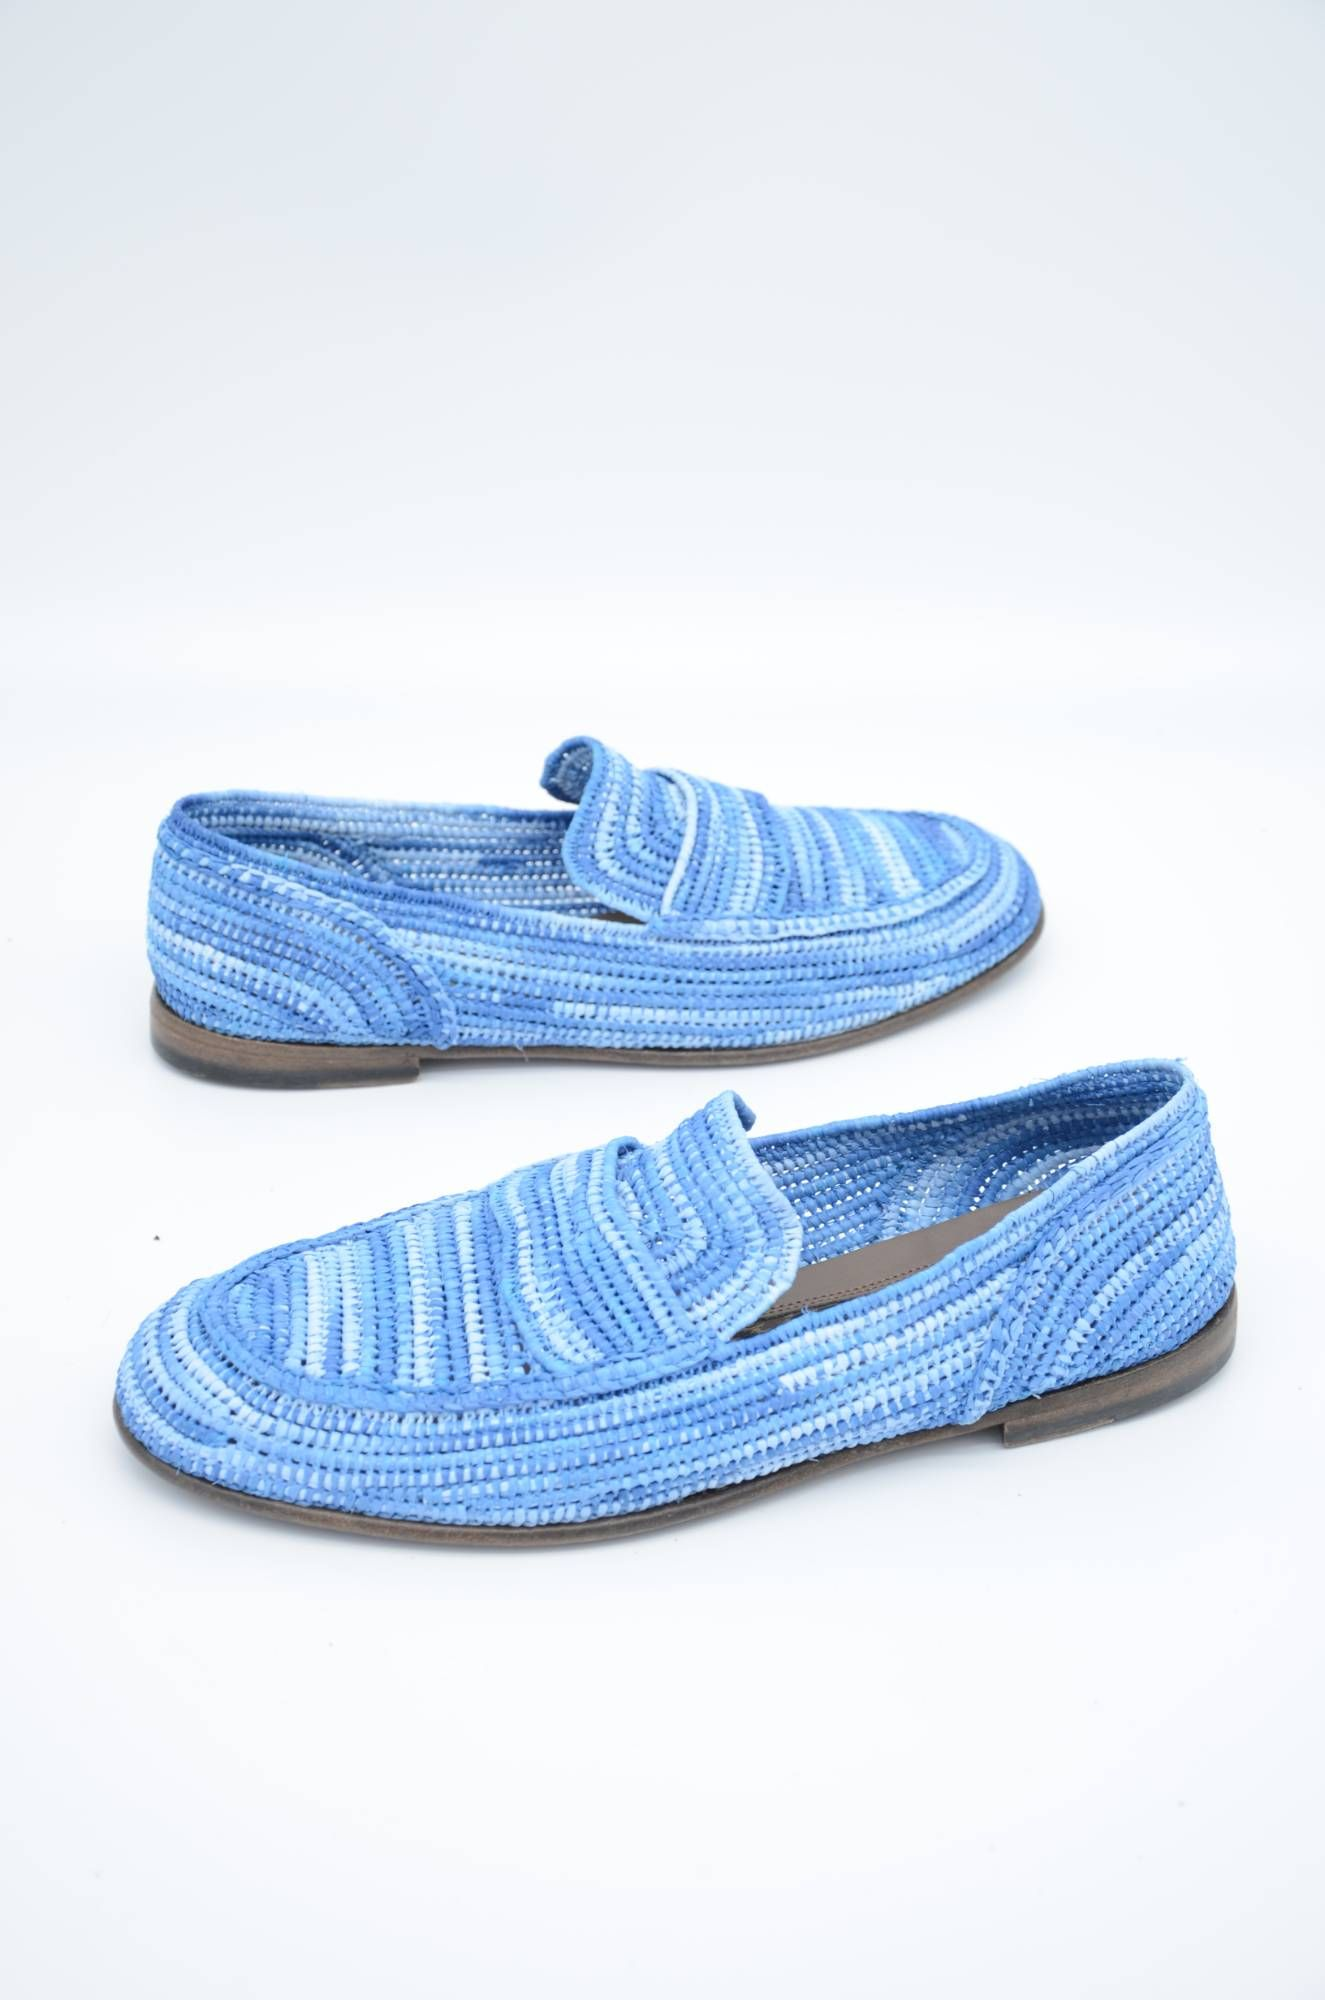 Dolce & Gabbana Men Loafers